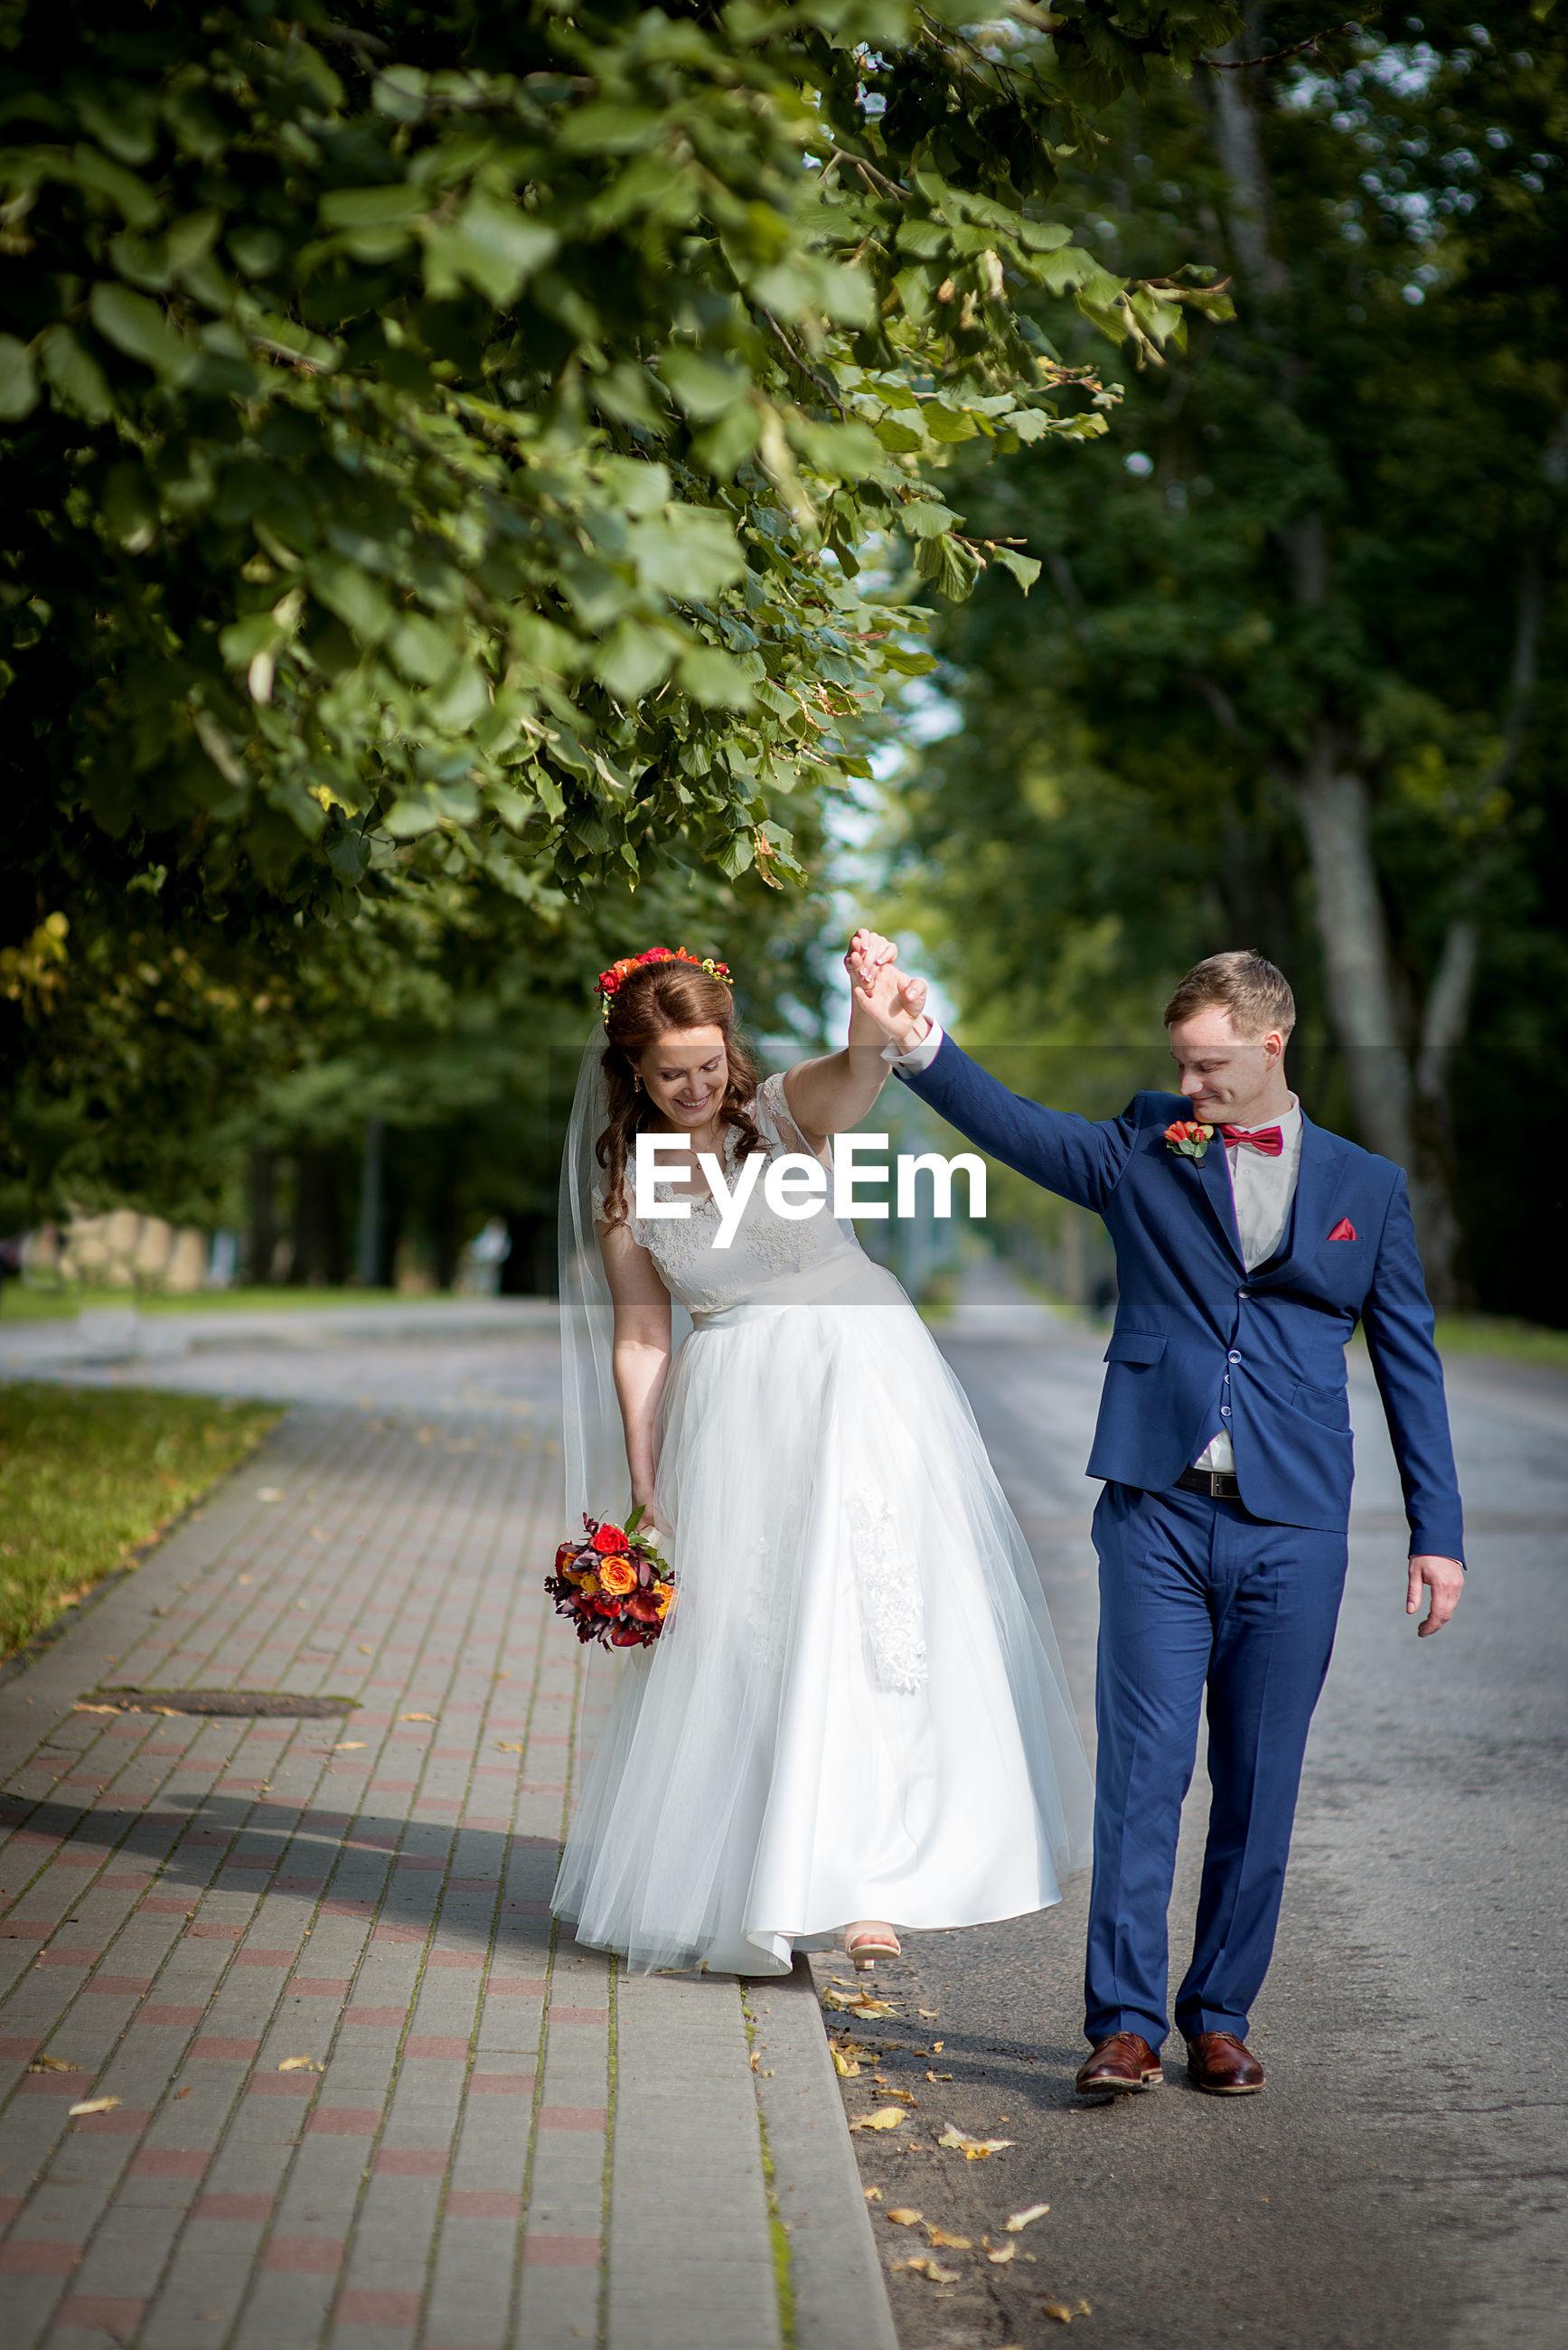 Bride and groom walking at park